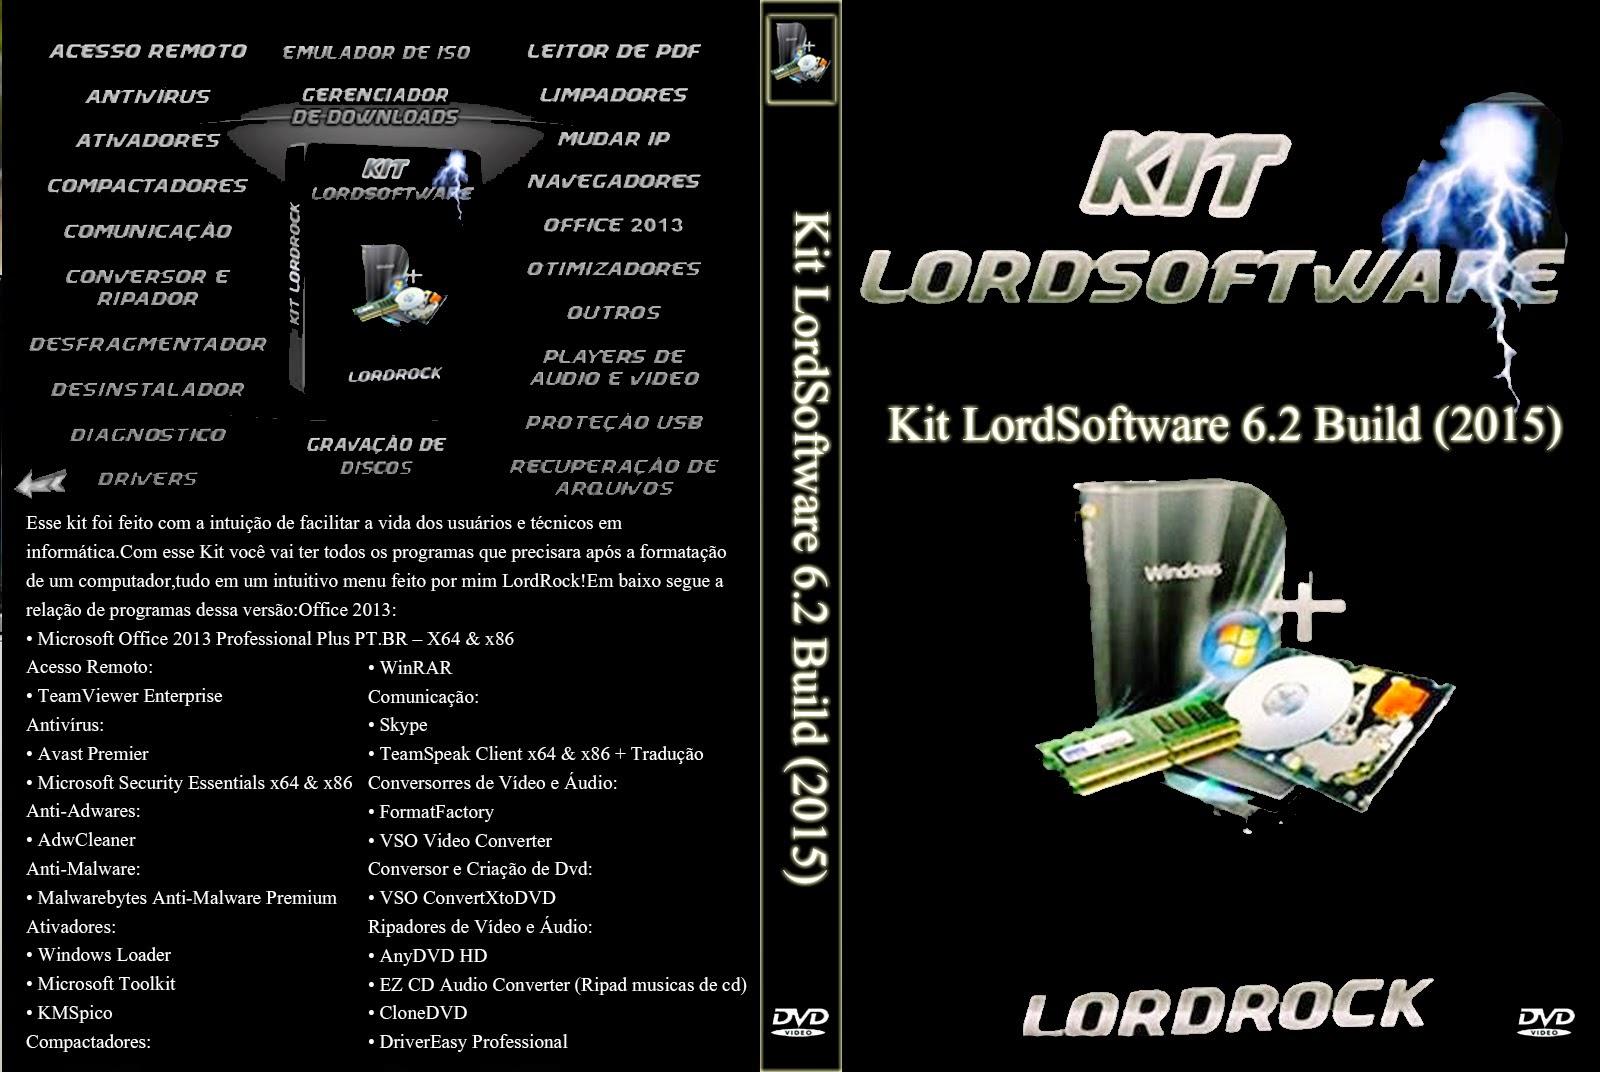 Download Kit LordSoftware 2015 7.1 Build 01.01.2015